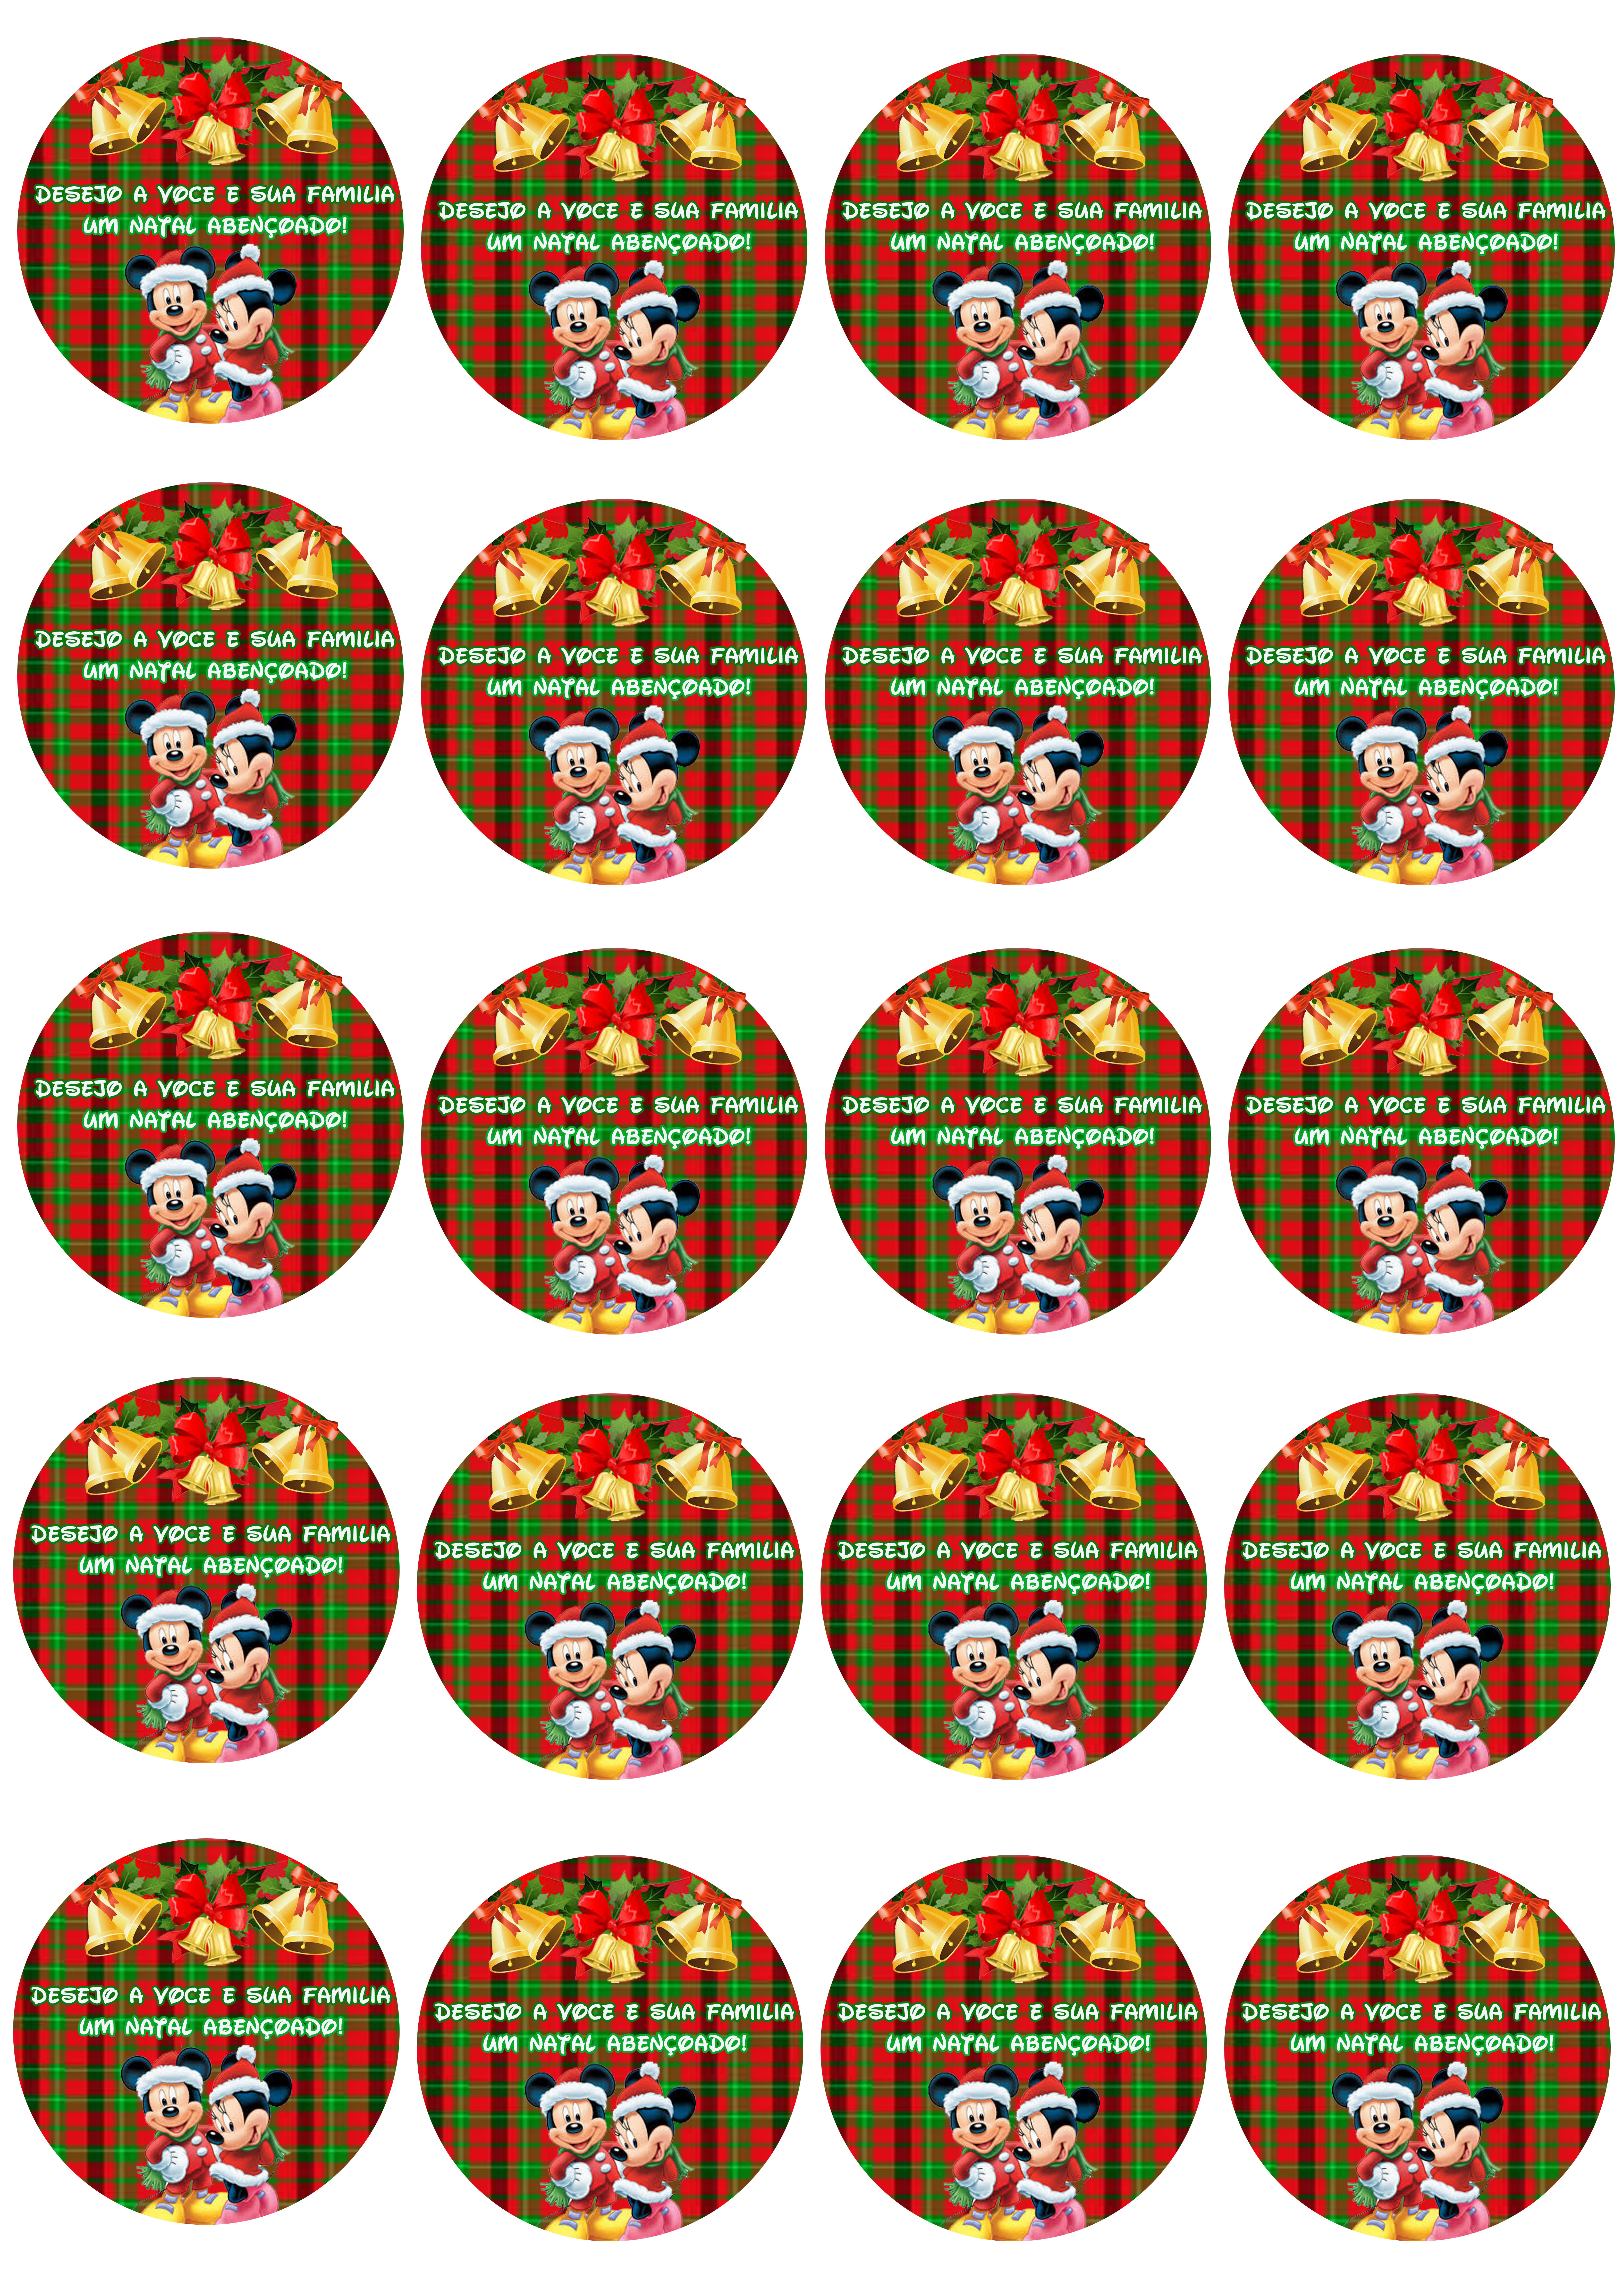 Adesivo De Flamingo ~ Adesivo,Rótulo de Natal Para imprimir ANABELLE ARTE E CRIA u00c7 u00d5ES Elo7